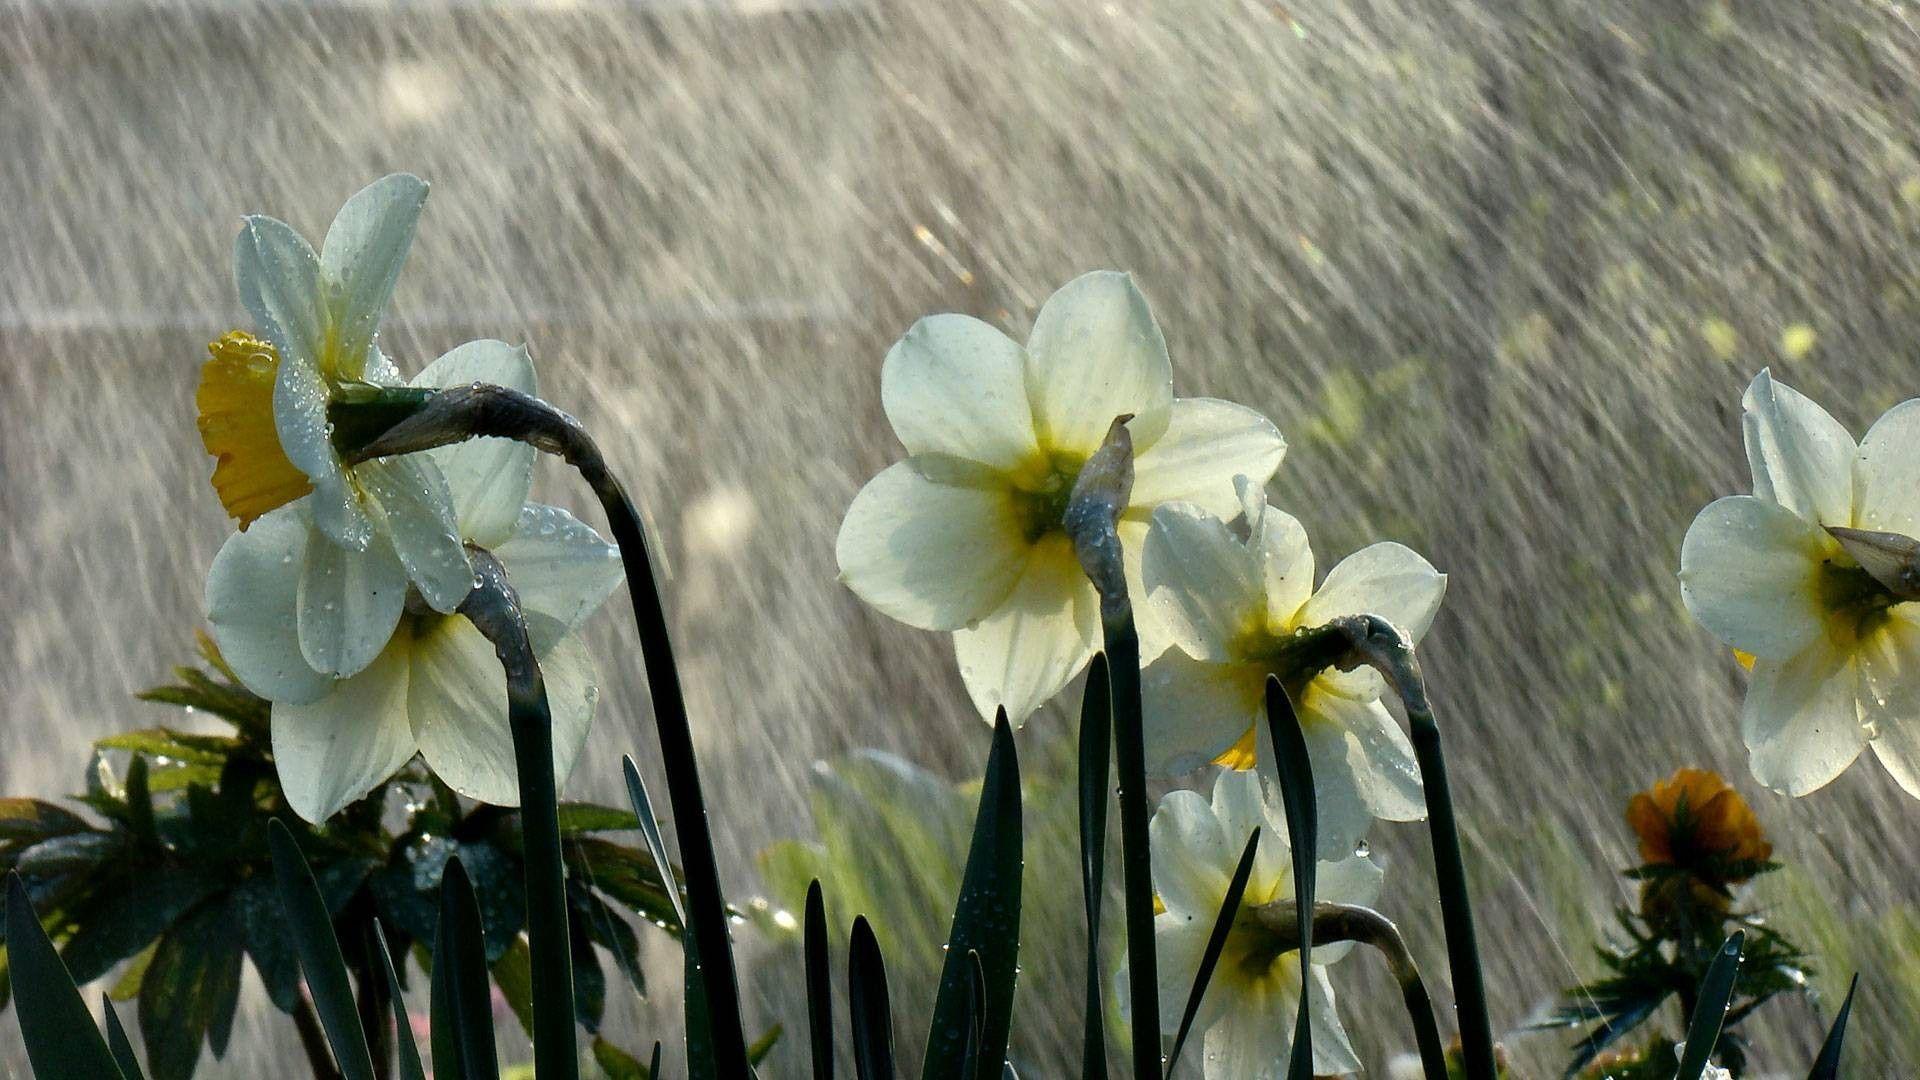 Spring-Rain-High-Quality-wallpaper-wpc5808970